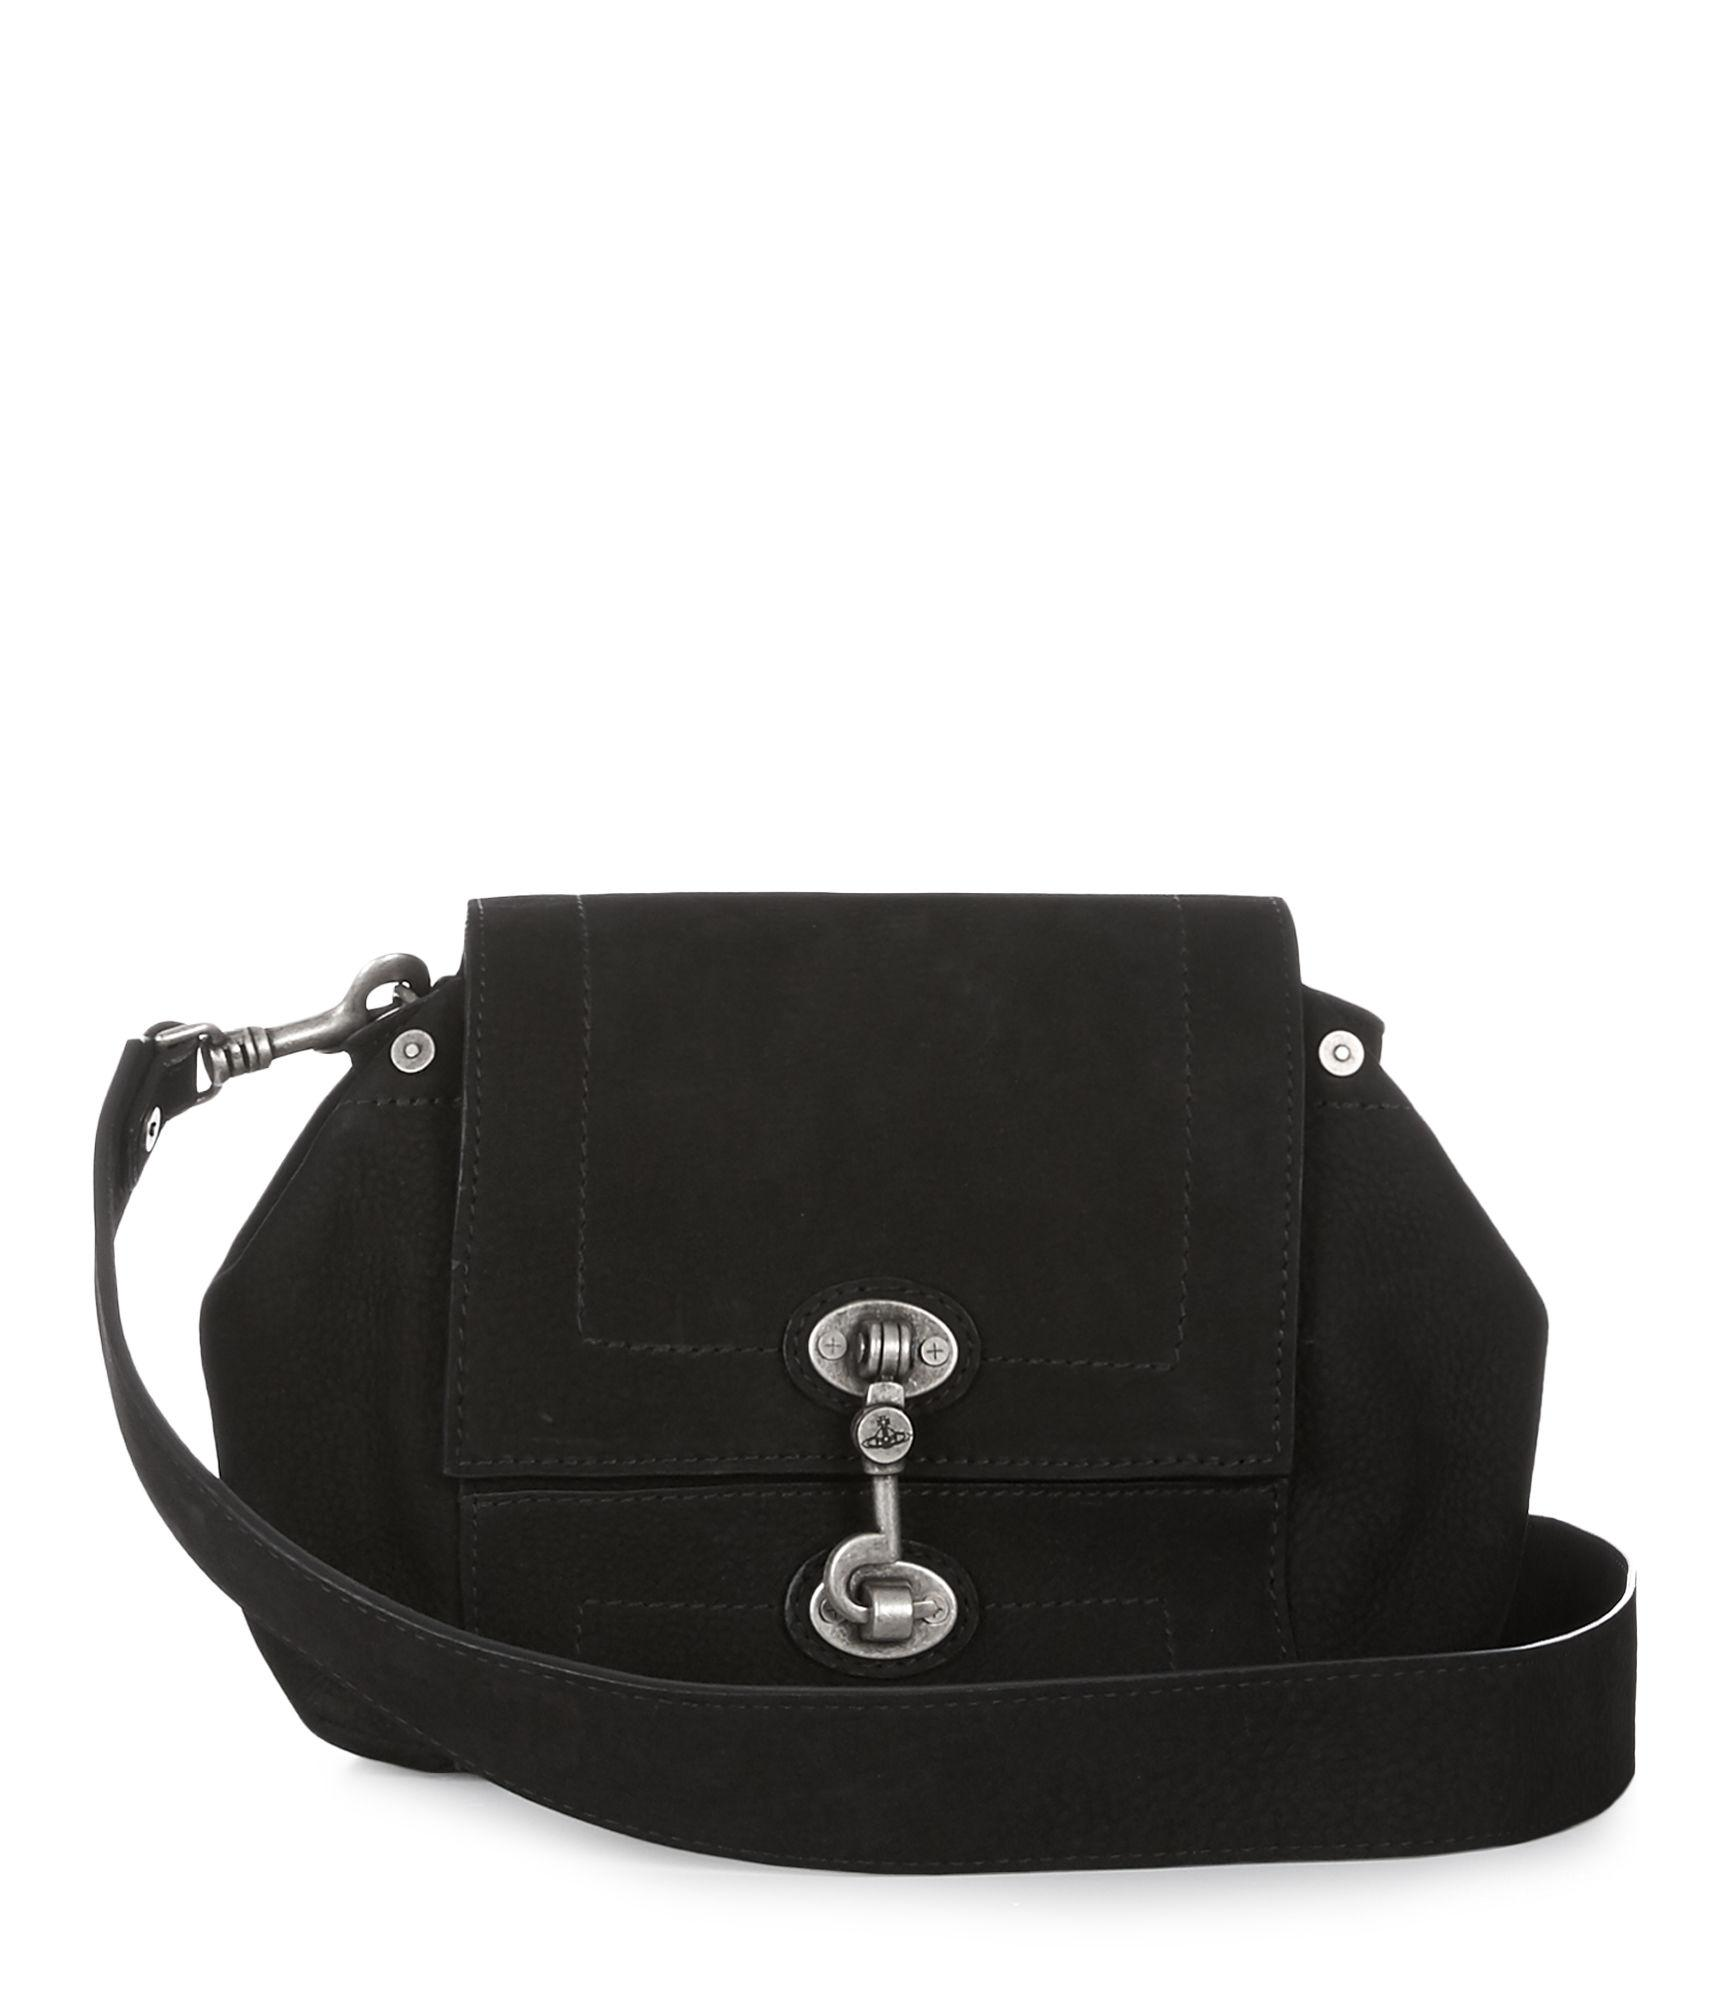 21bfb68abca Vivienne Westwood Manchester Crossbody Bag 43030022 Black | ModeSens